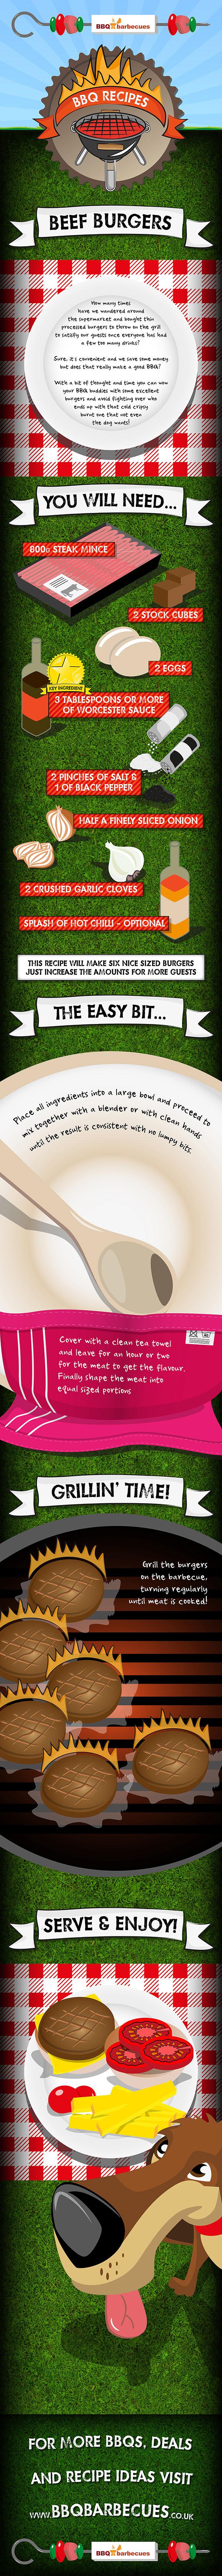 BBQ Recipe Infographic